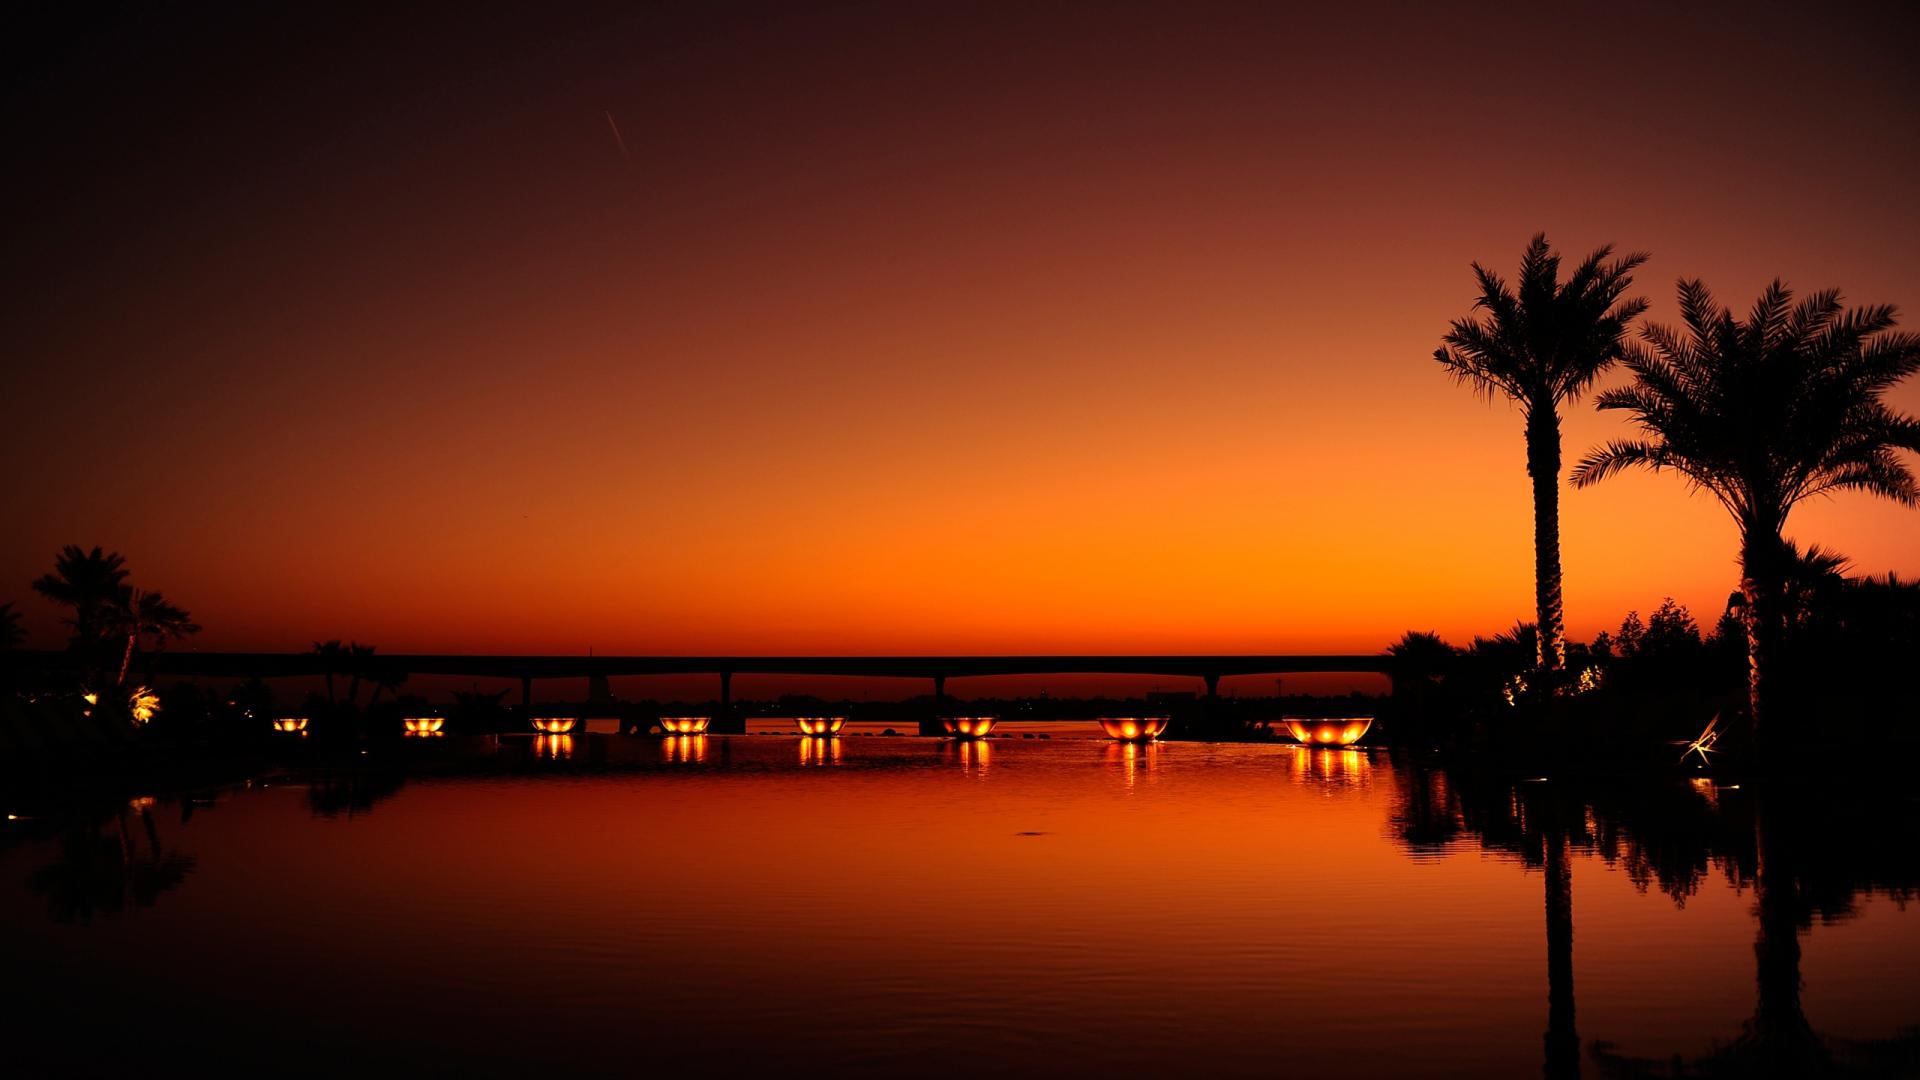 Popular Wallpaper Night Evening - dubai_night_evening_sunset_orange_black_palm_trees_water_light_reflection_58546_1920x1080  Perfect Image Reference-843866.jpg